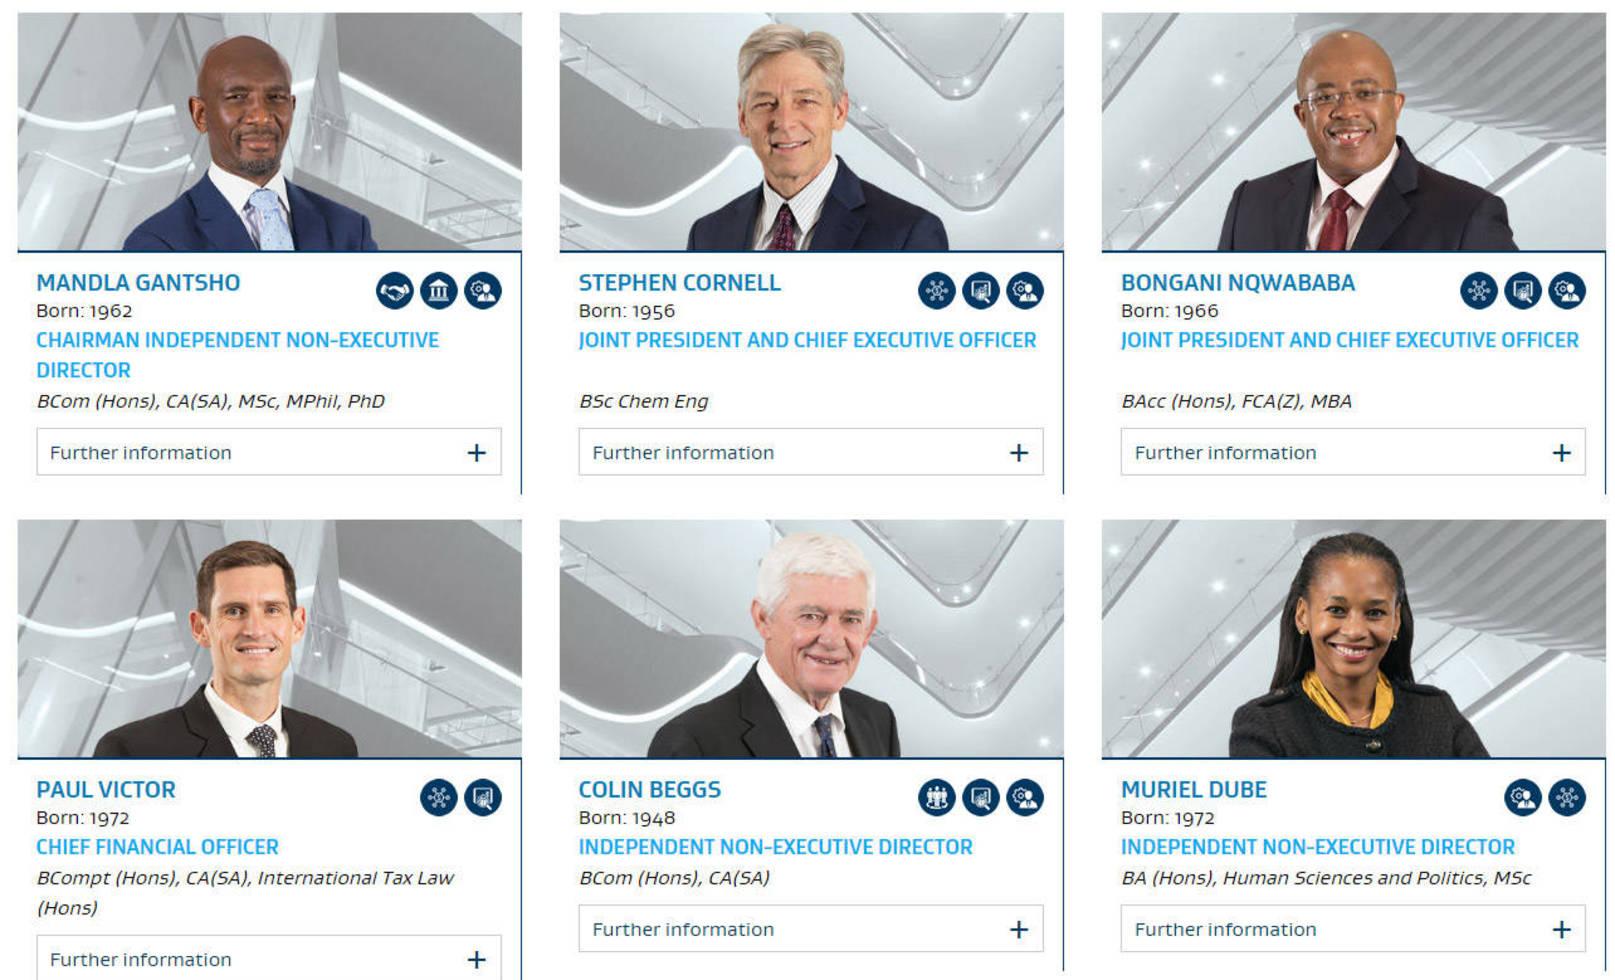 Sasol Integrated report 2018 - Board of Directors